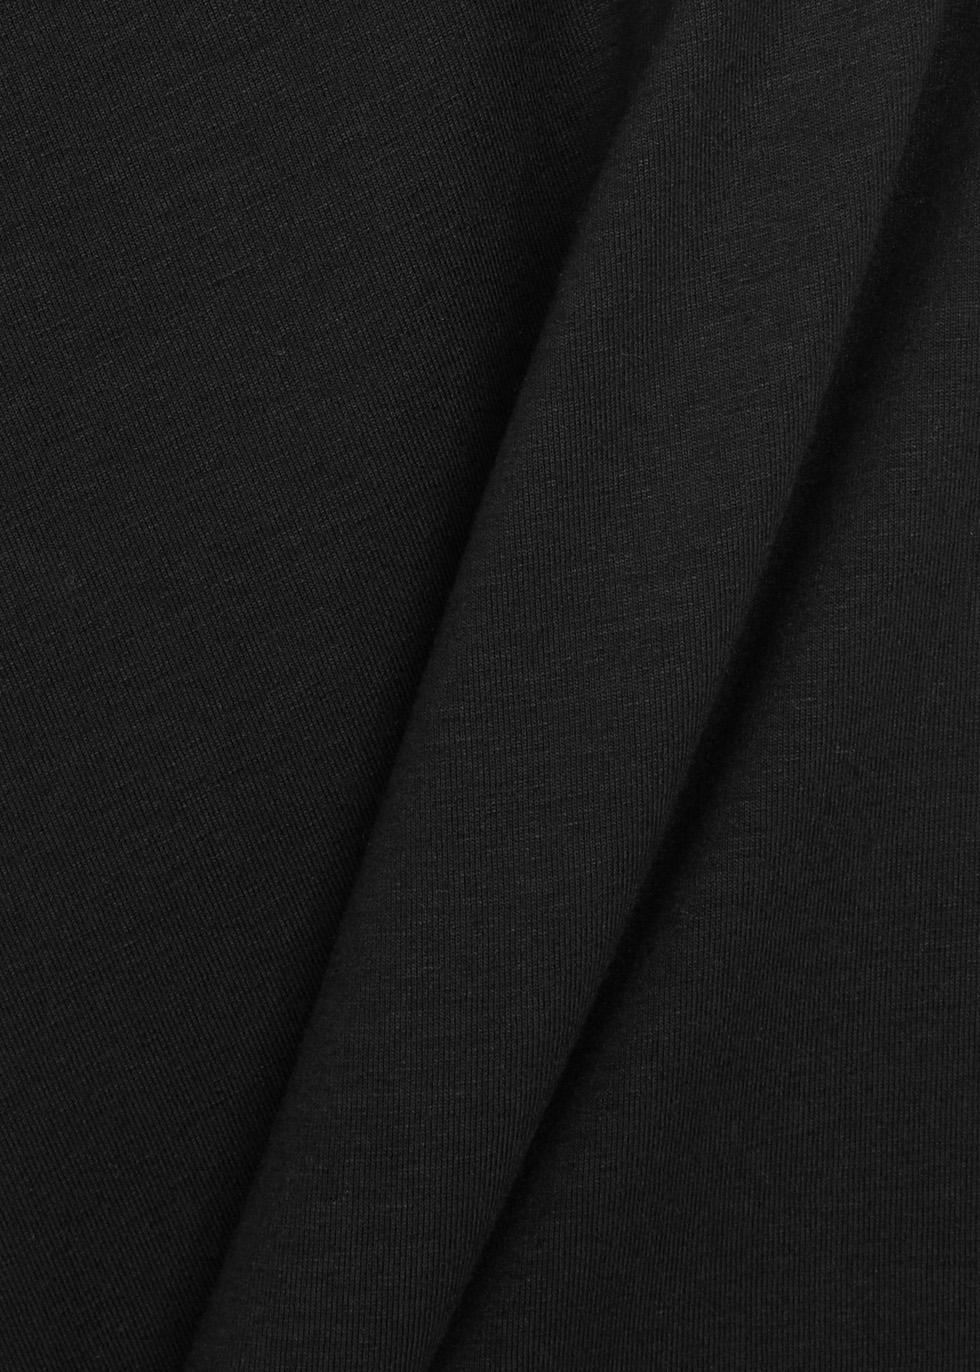 System black jersey tank - EILEEN FISHER